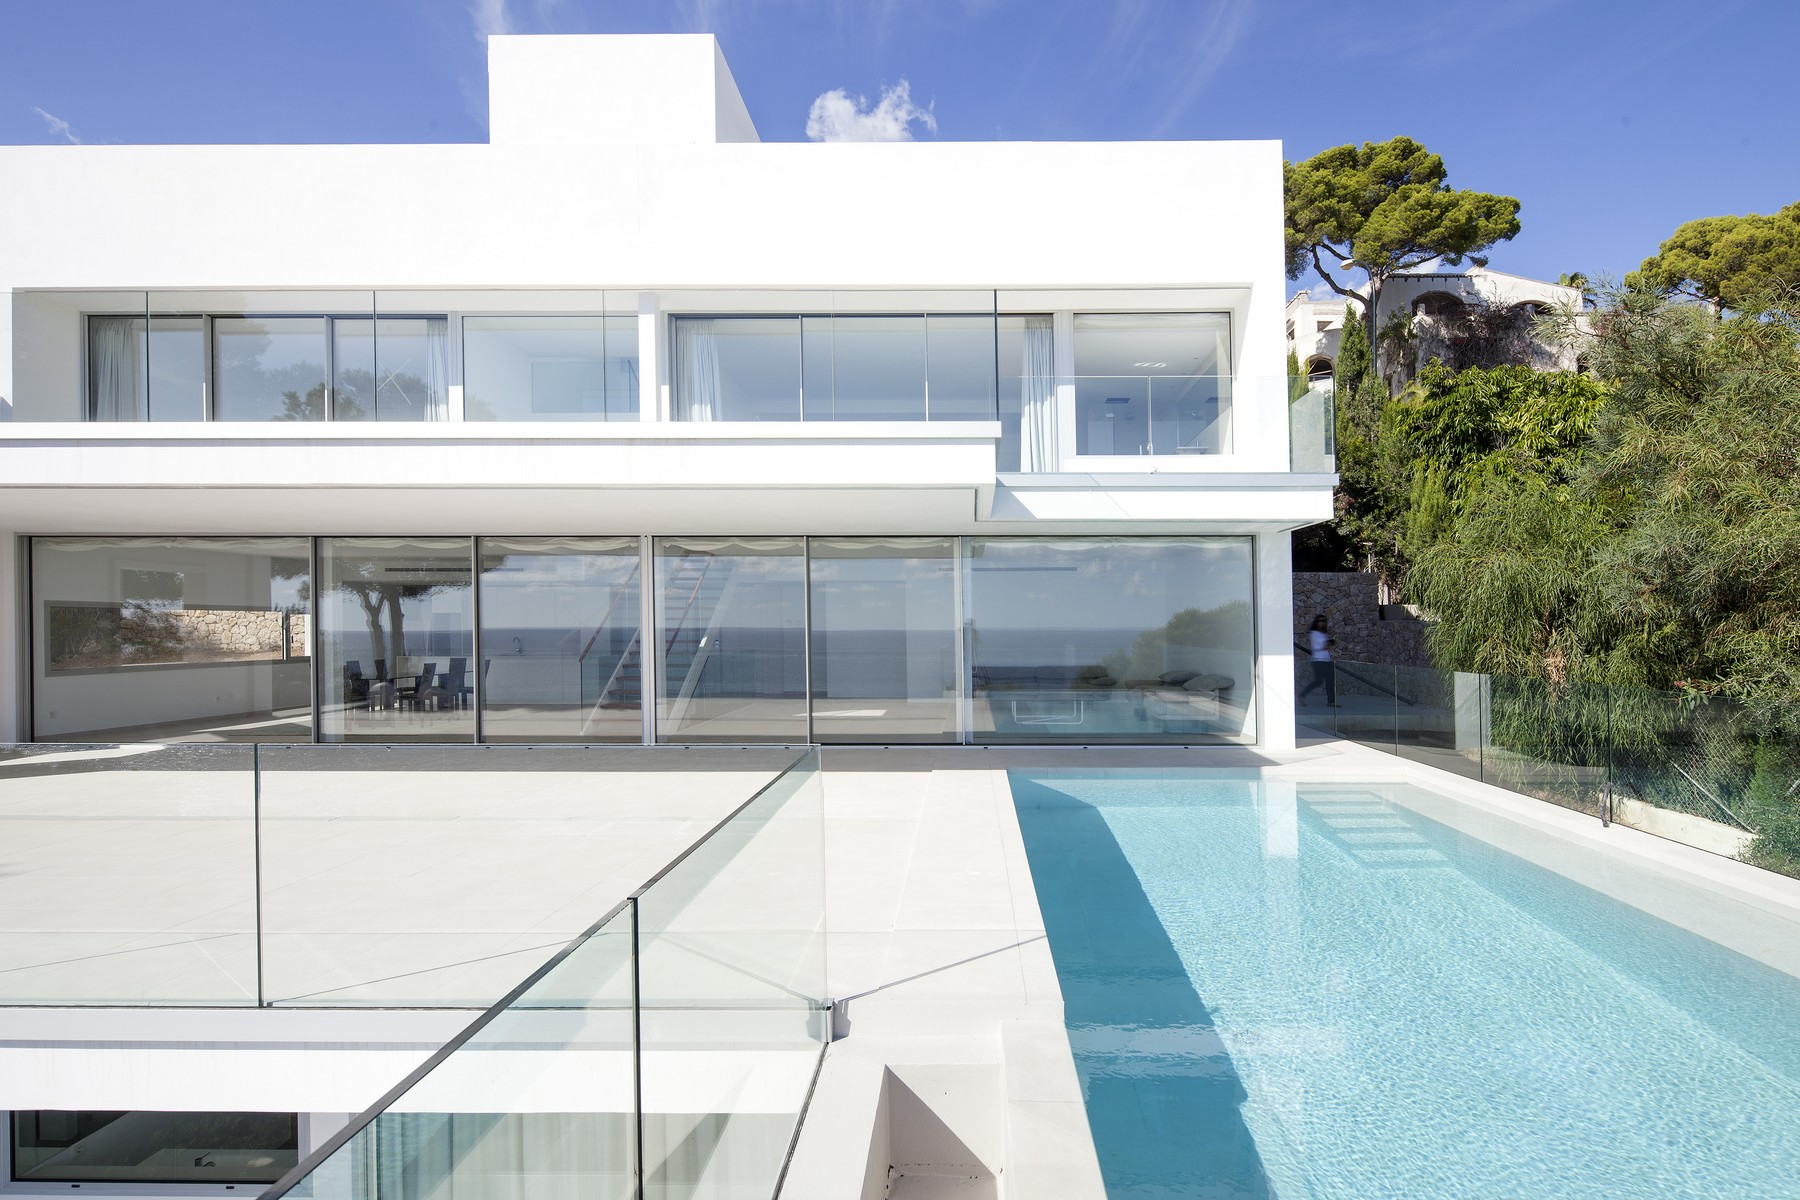 واحد منزل الأسرة للـ Sale في Modern House in Cala Provensals for sale, Capdepera, Palma Capdepera, Mallorca, Spain